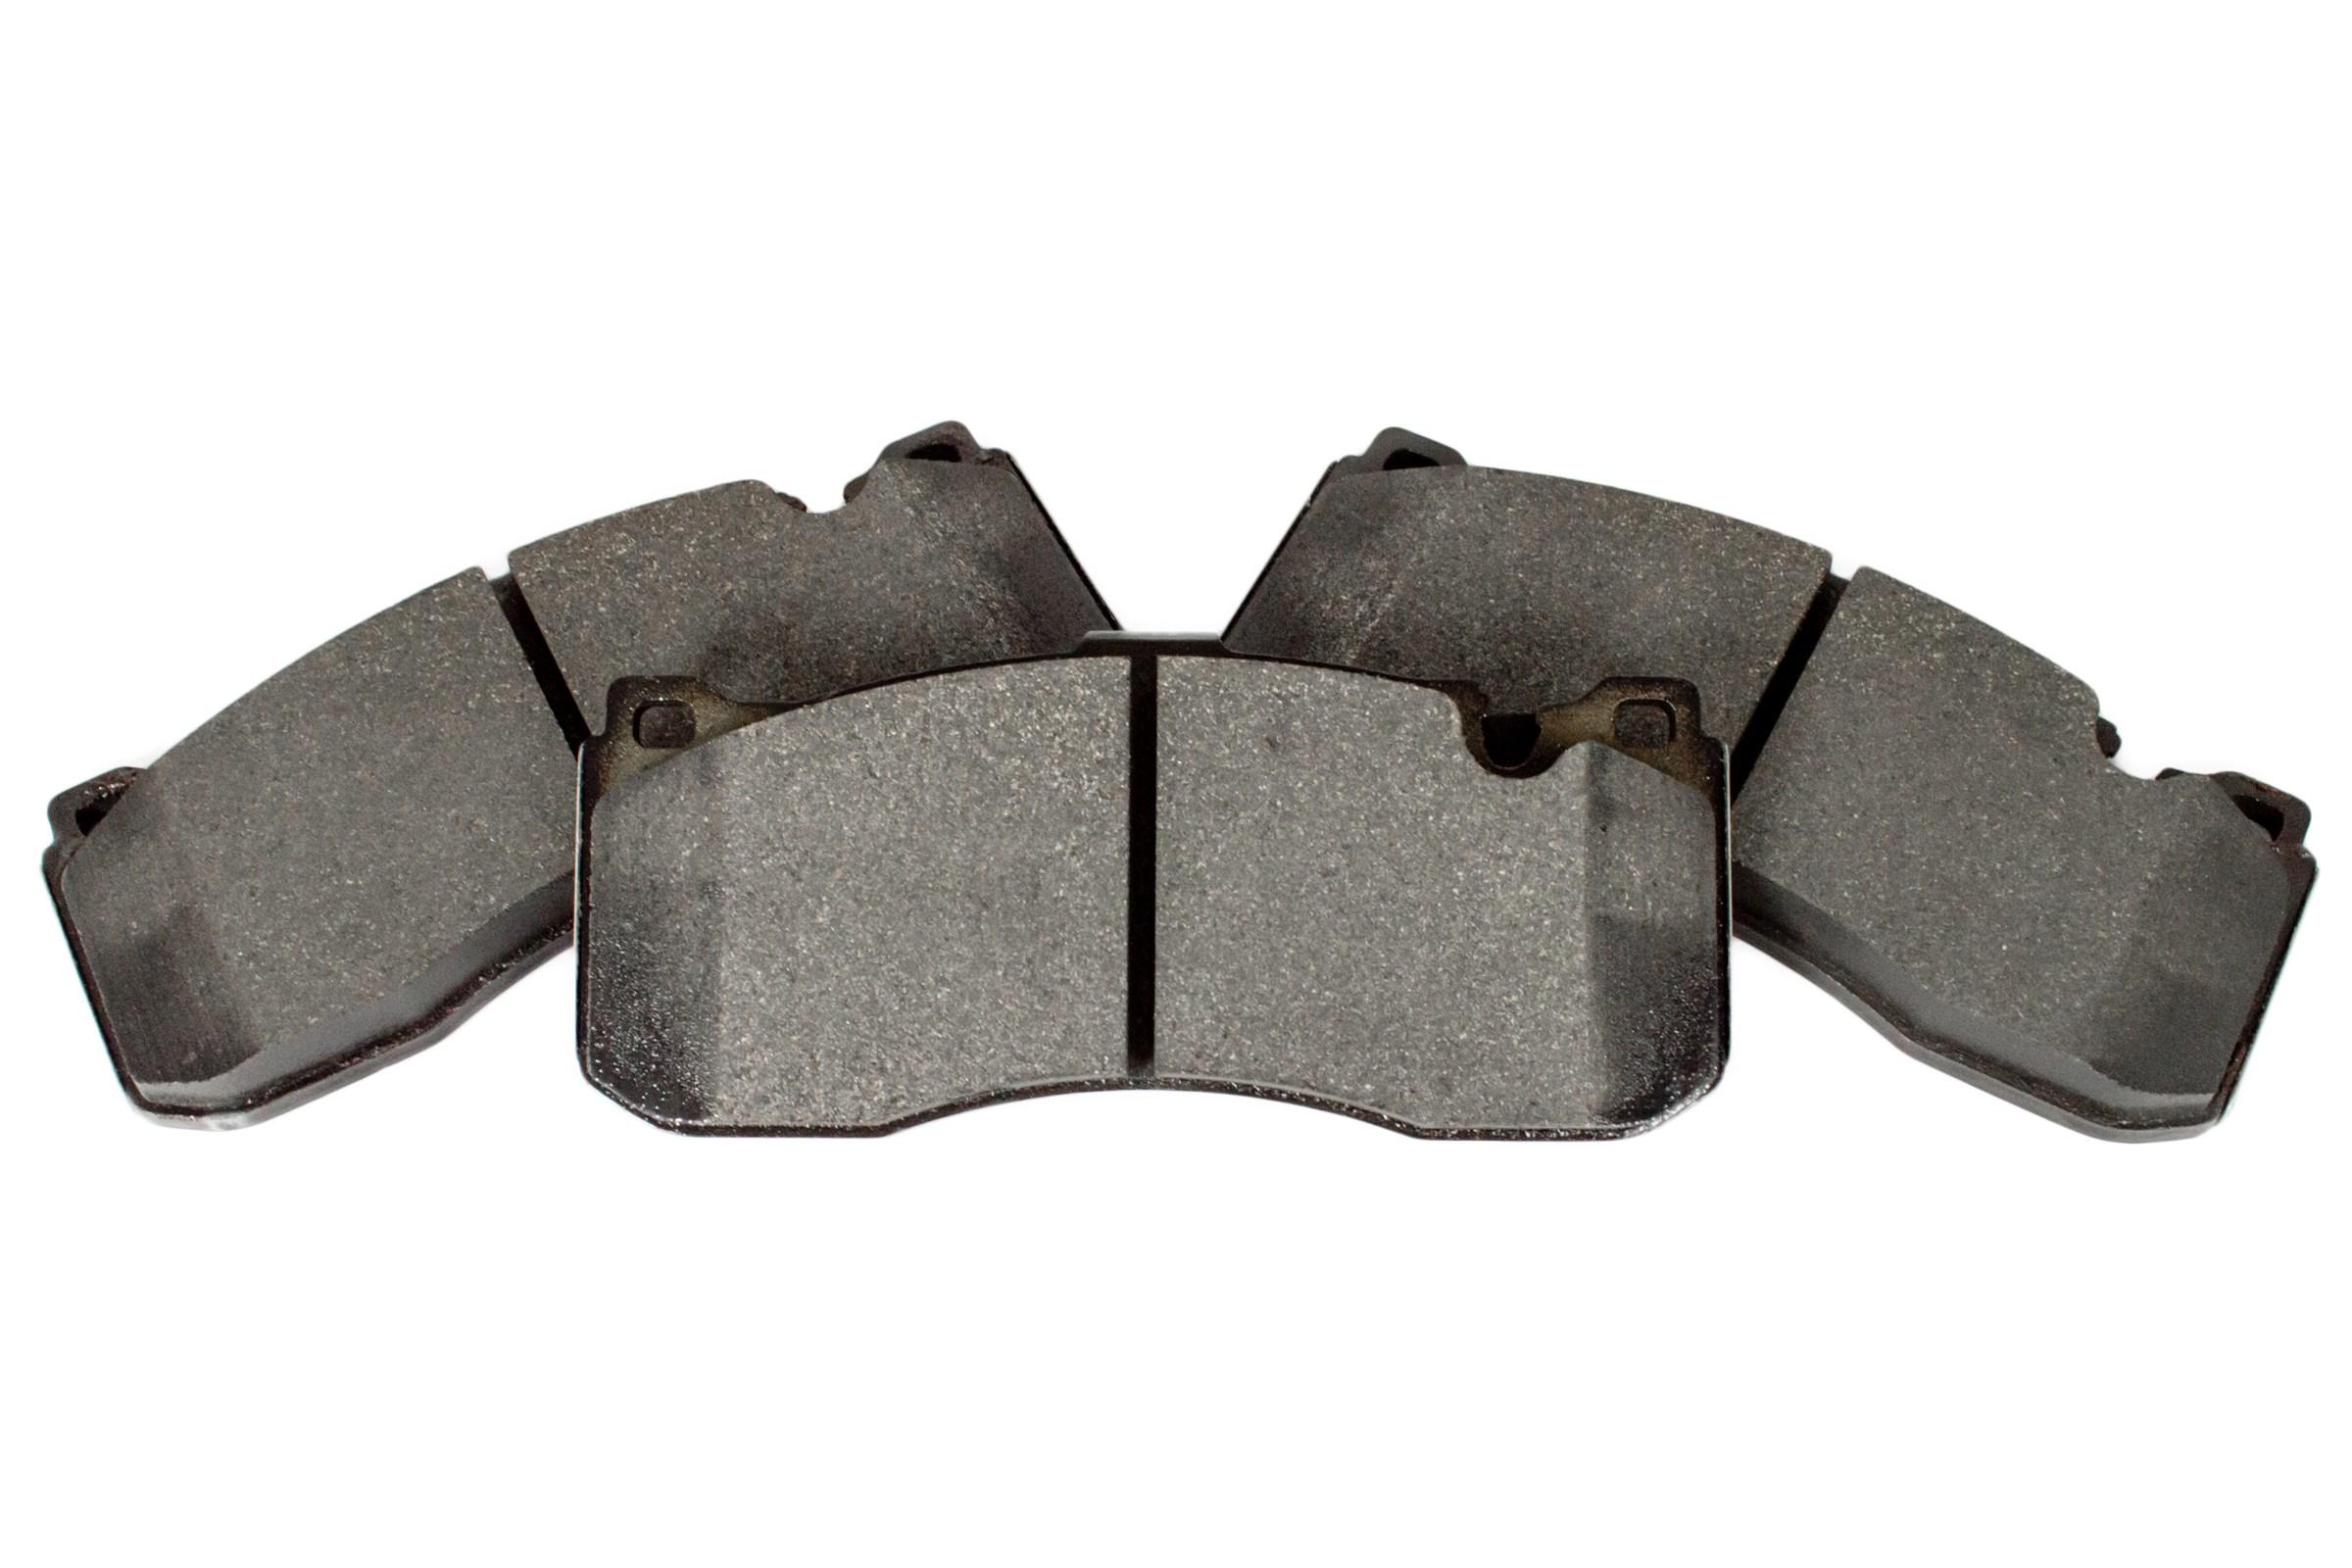 NEW! Mintex M1144 Front Brake Pads for Gen 2 GP2 MINIs